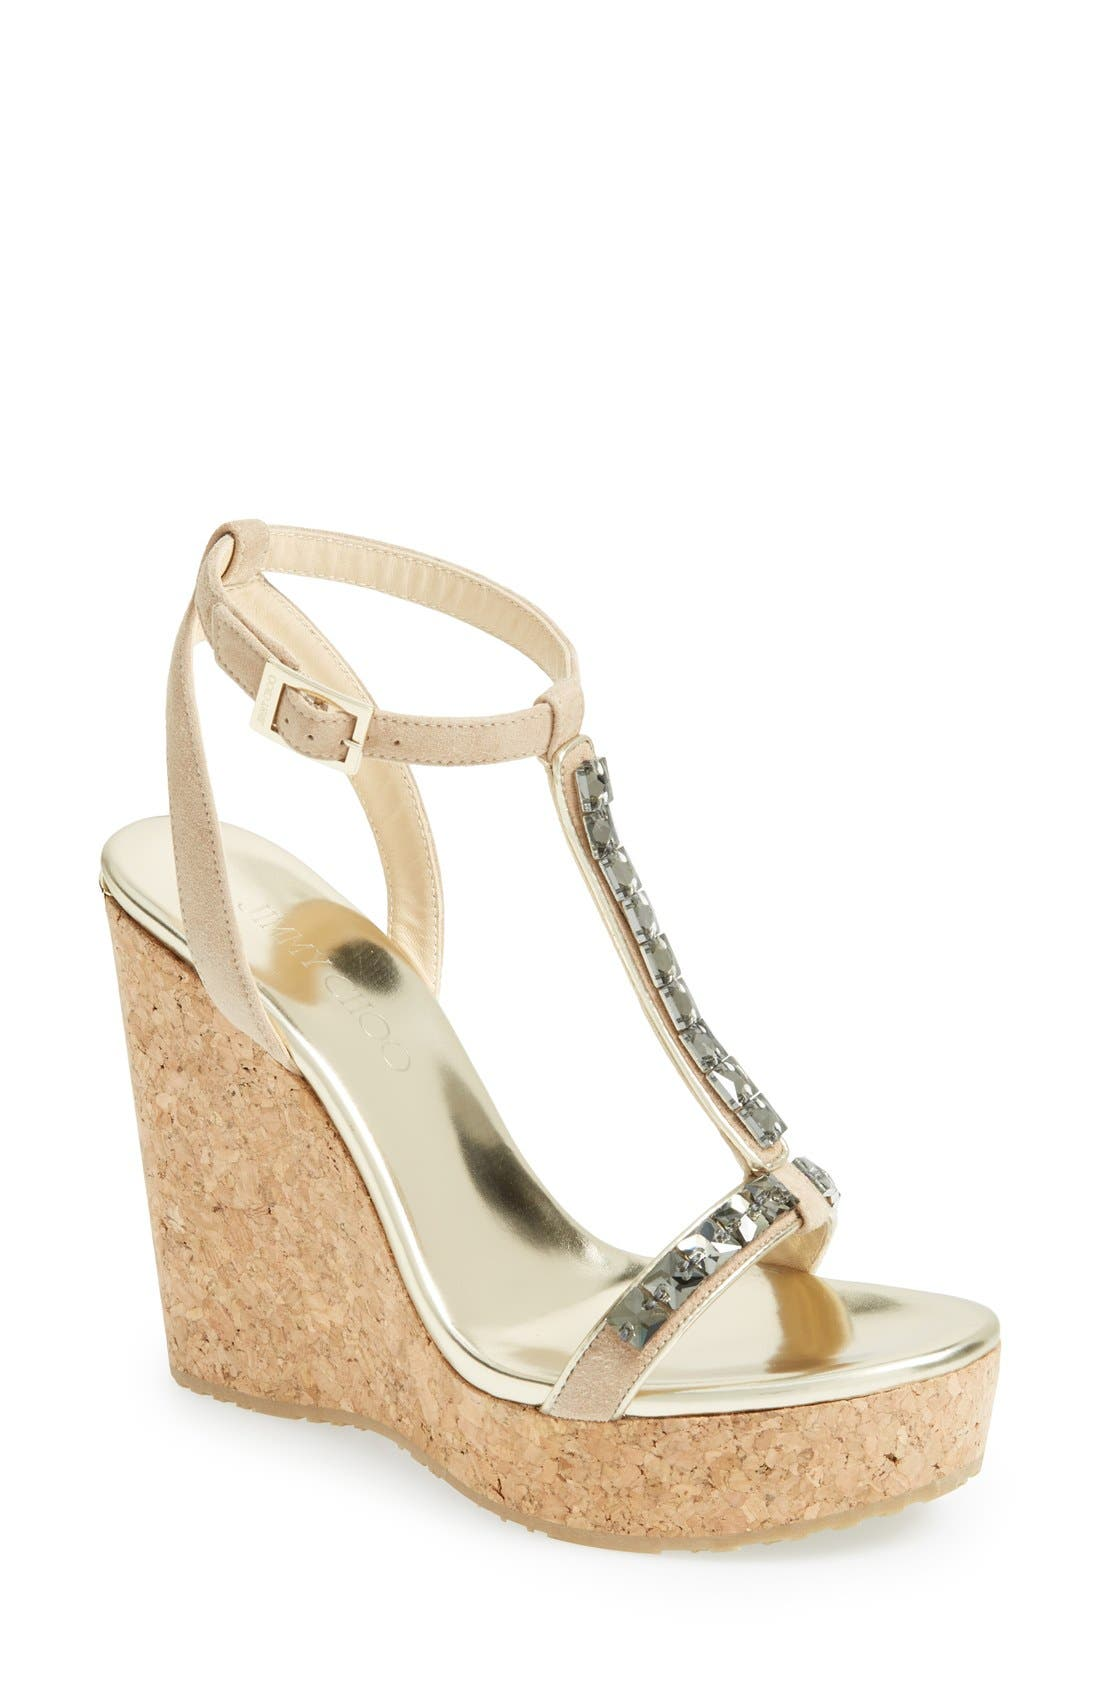 Alternate Image 1 Selected - Jimmy Choo 'Naima' Jeweled T-Strap Wedge Sandal (Women)